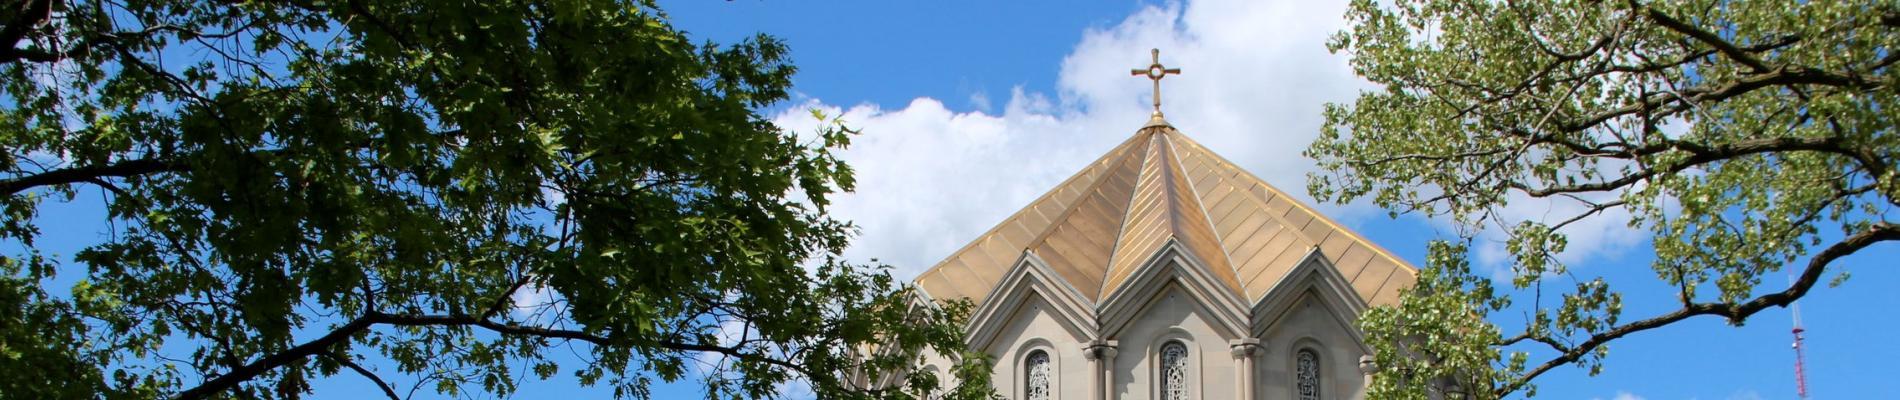 St. John Armenian Apostolic Orthodox Church